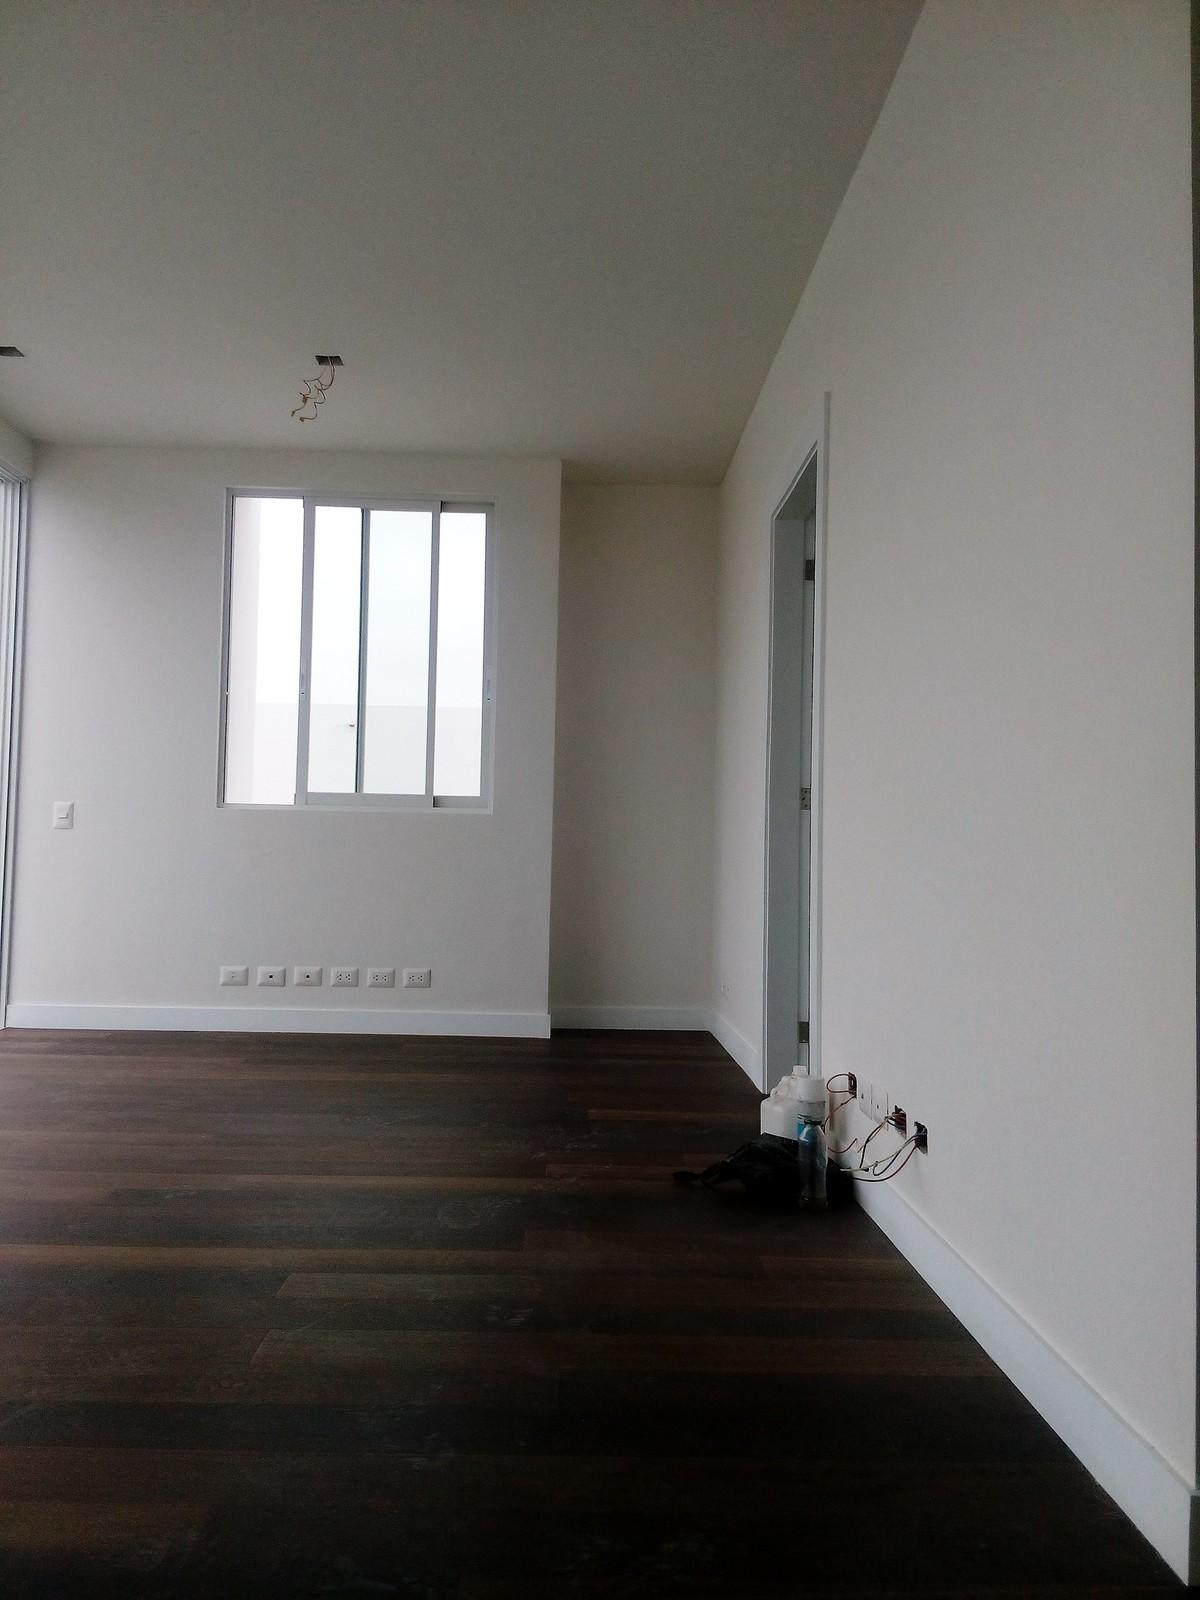 16 de 20: Sala de estar en el segundo nivel con salida a terraza